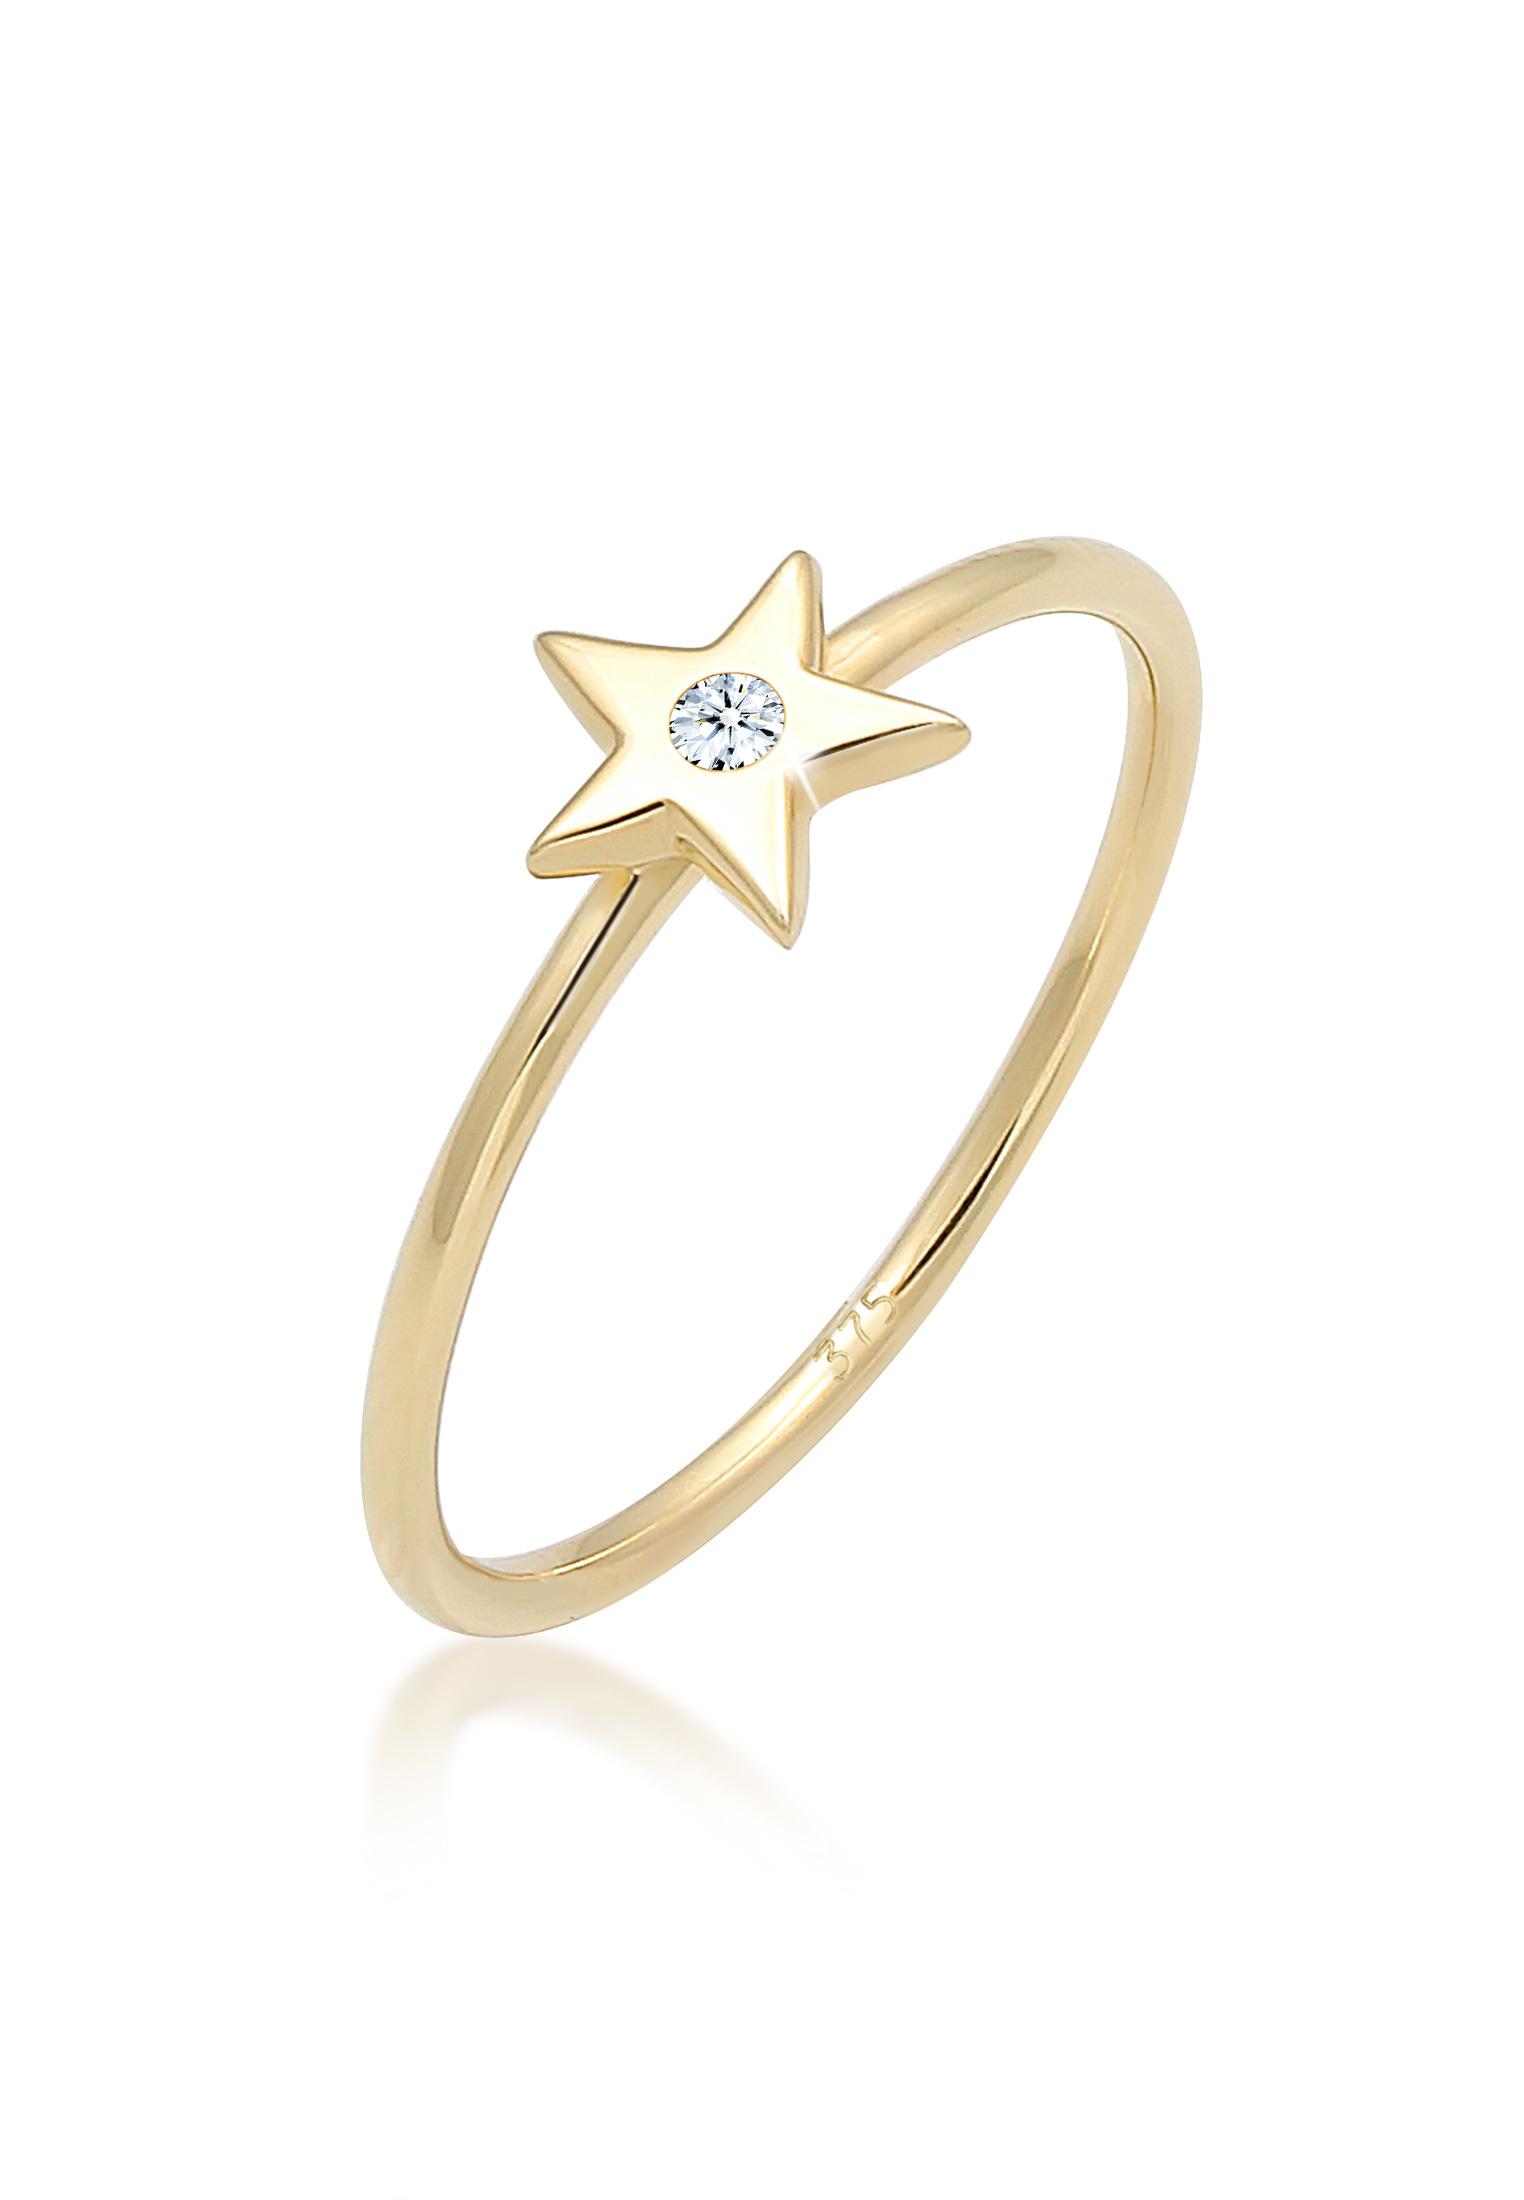 Ring Astro | Diamant ( Weiß, 0,015 ct ) | 375 Gelbgold